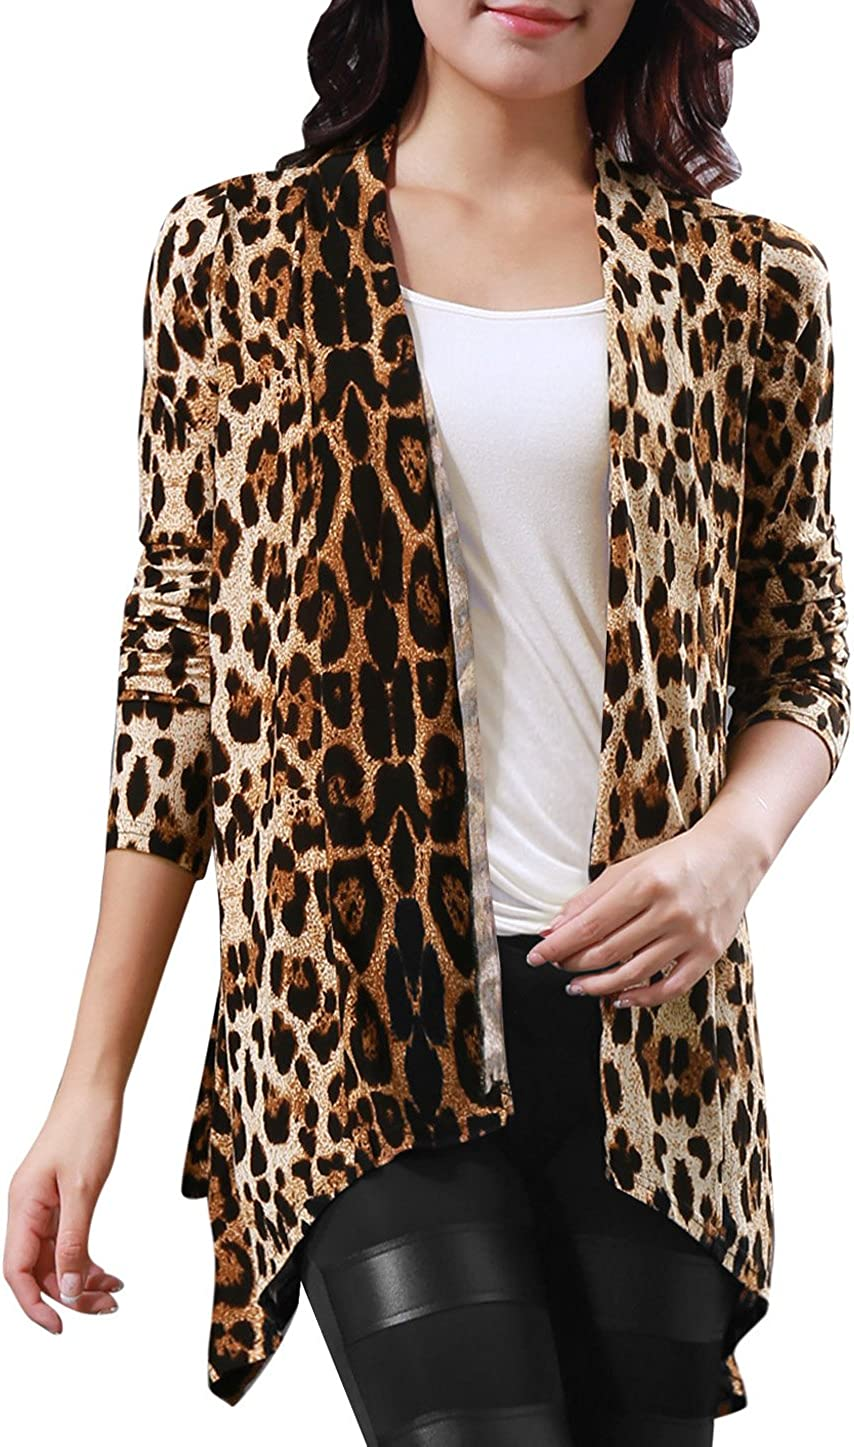 Allegra K Women's Long Sleeves Open Front Leopard Prints Cardigan